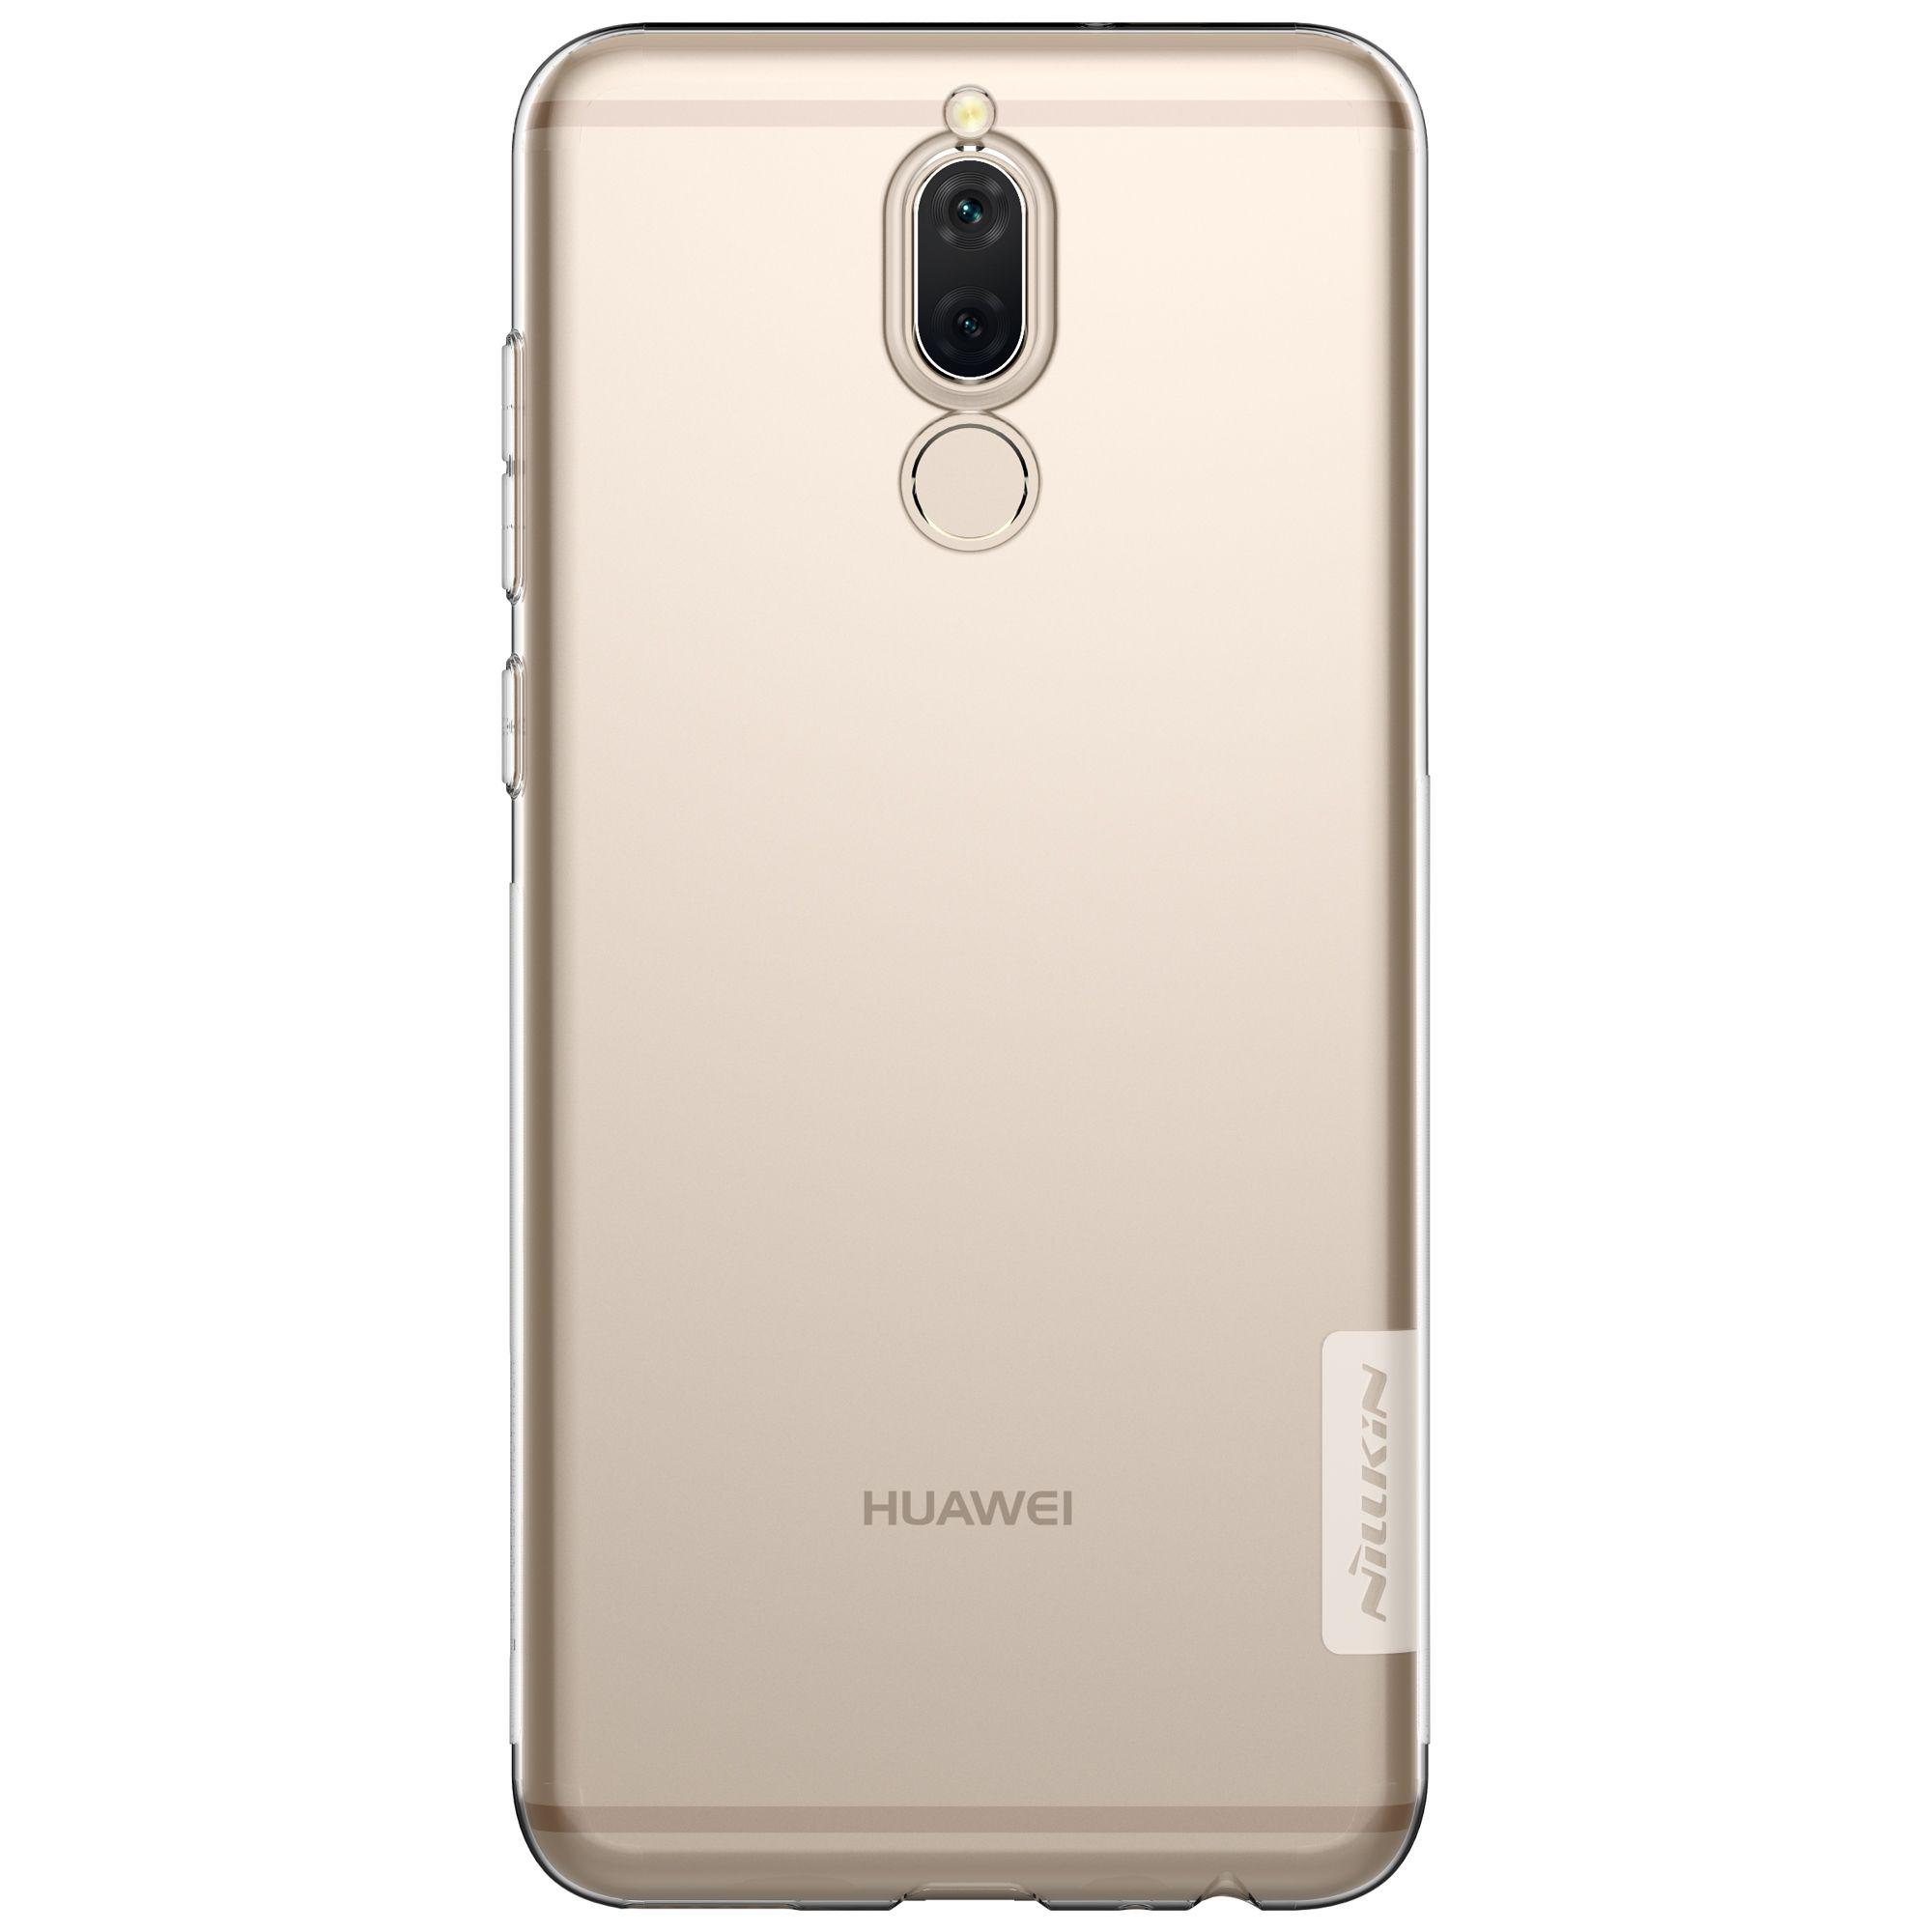 save off 58a7a 43034 NILLKIN Nature TPU back cover case for Huawei Nova 2i (Maimang 6) clear TPU  soft case Huawei Nova 2i cover with retailed package